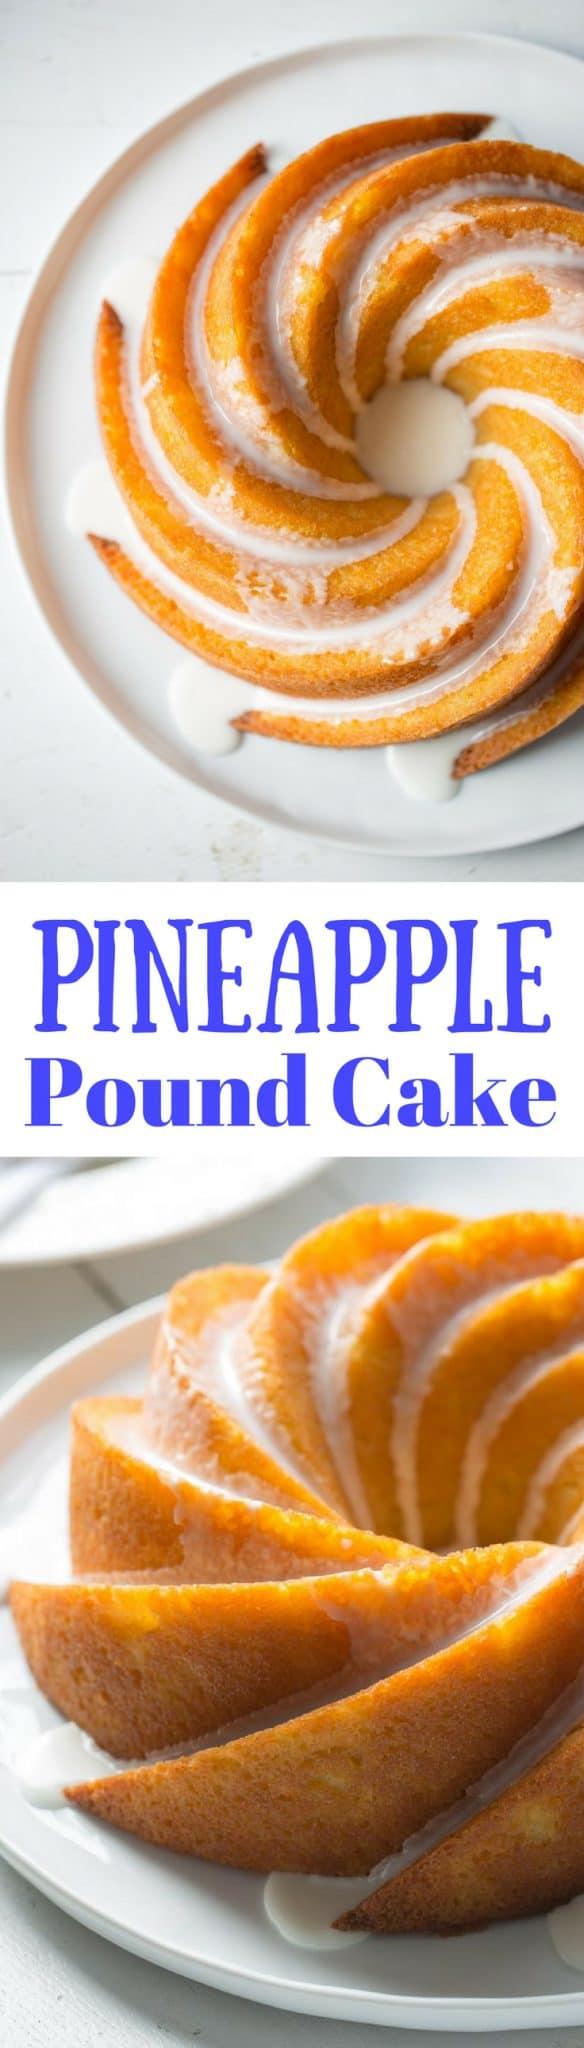 Moist pineapple pound cake recipe